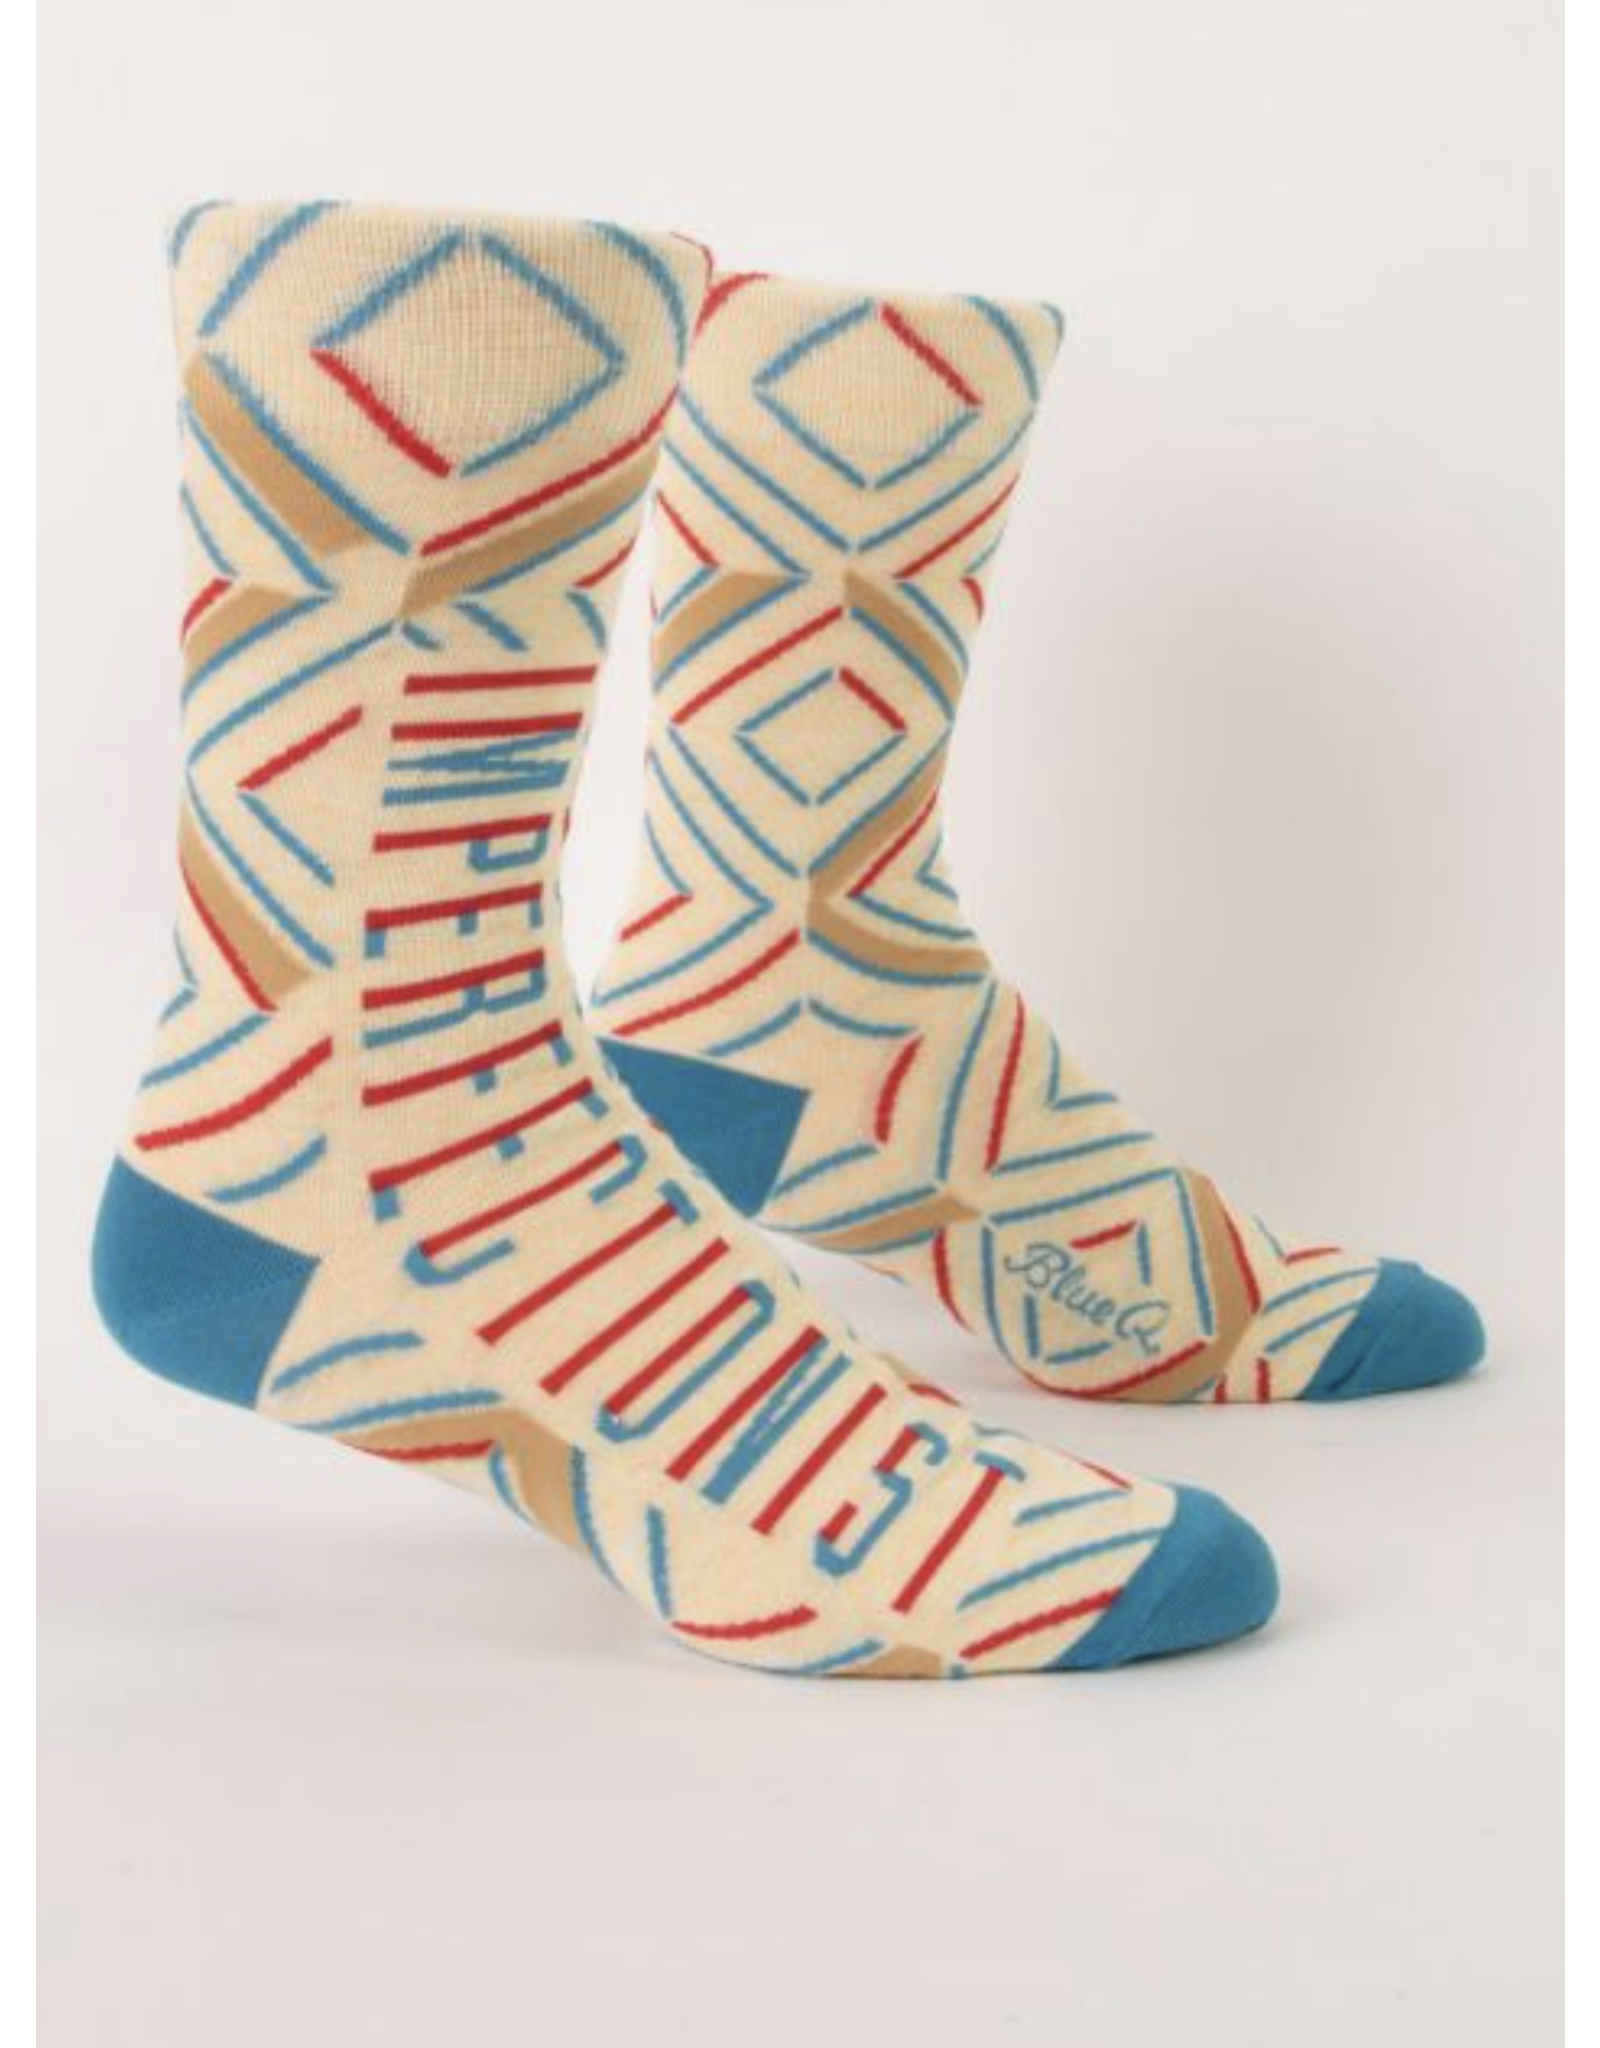 BQ Mens Sassy Socks - Imperfectionist